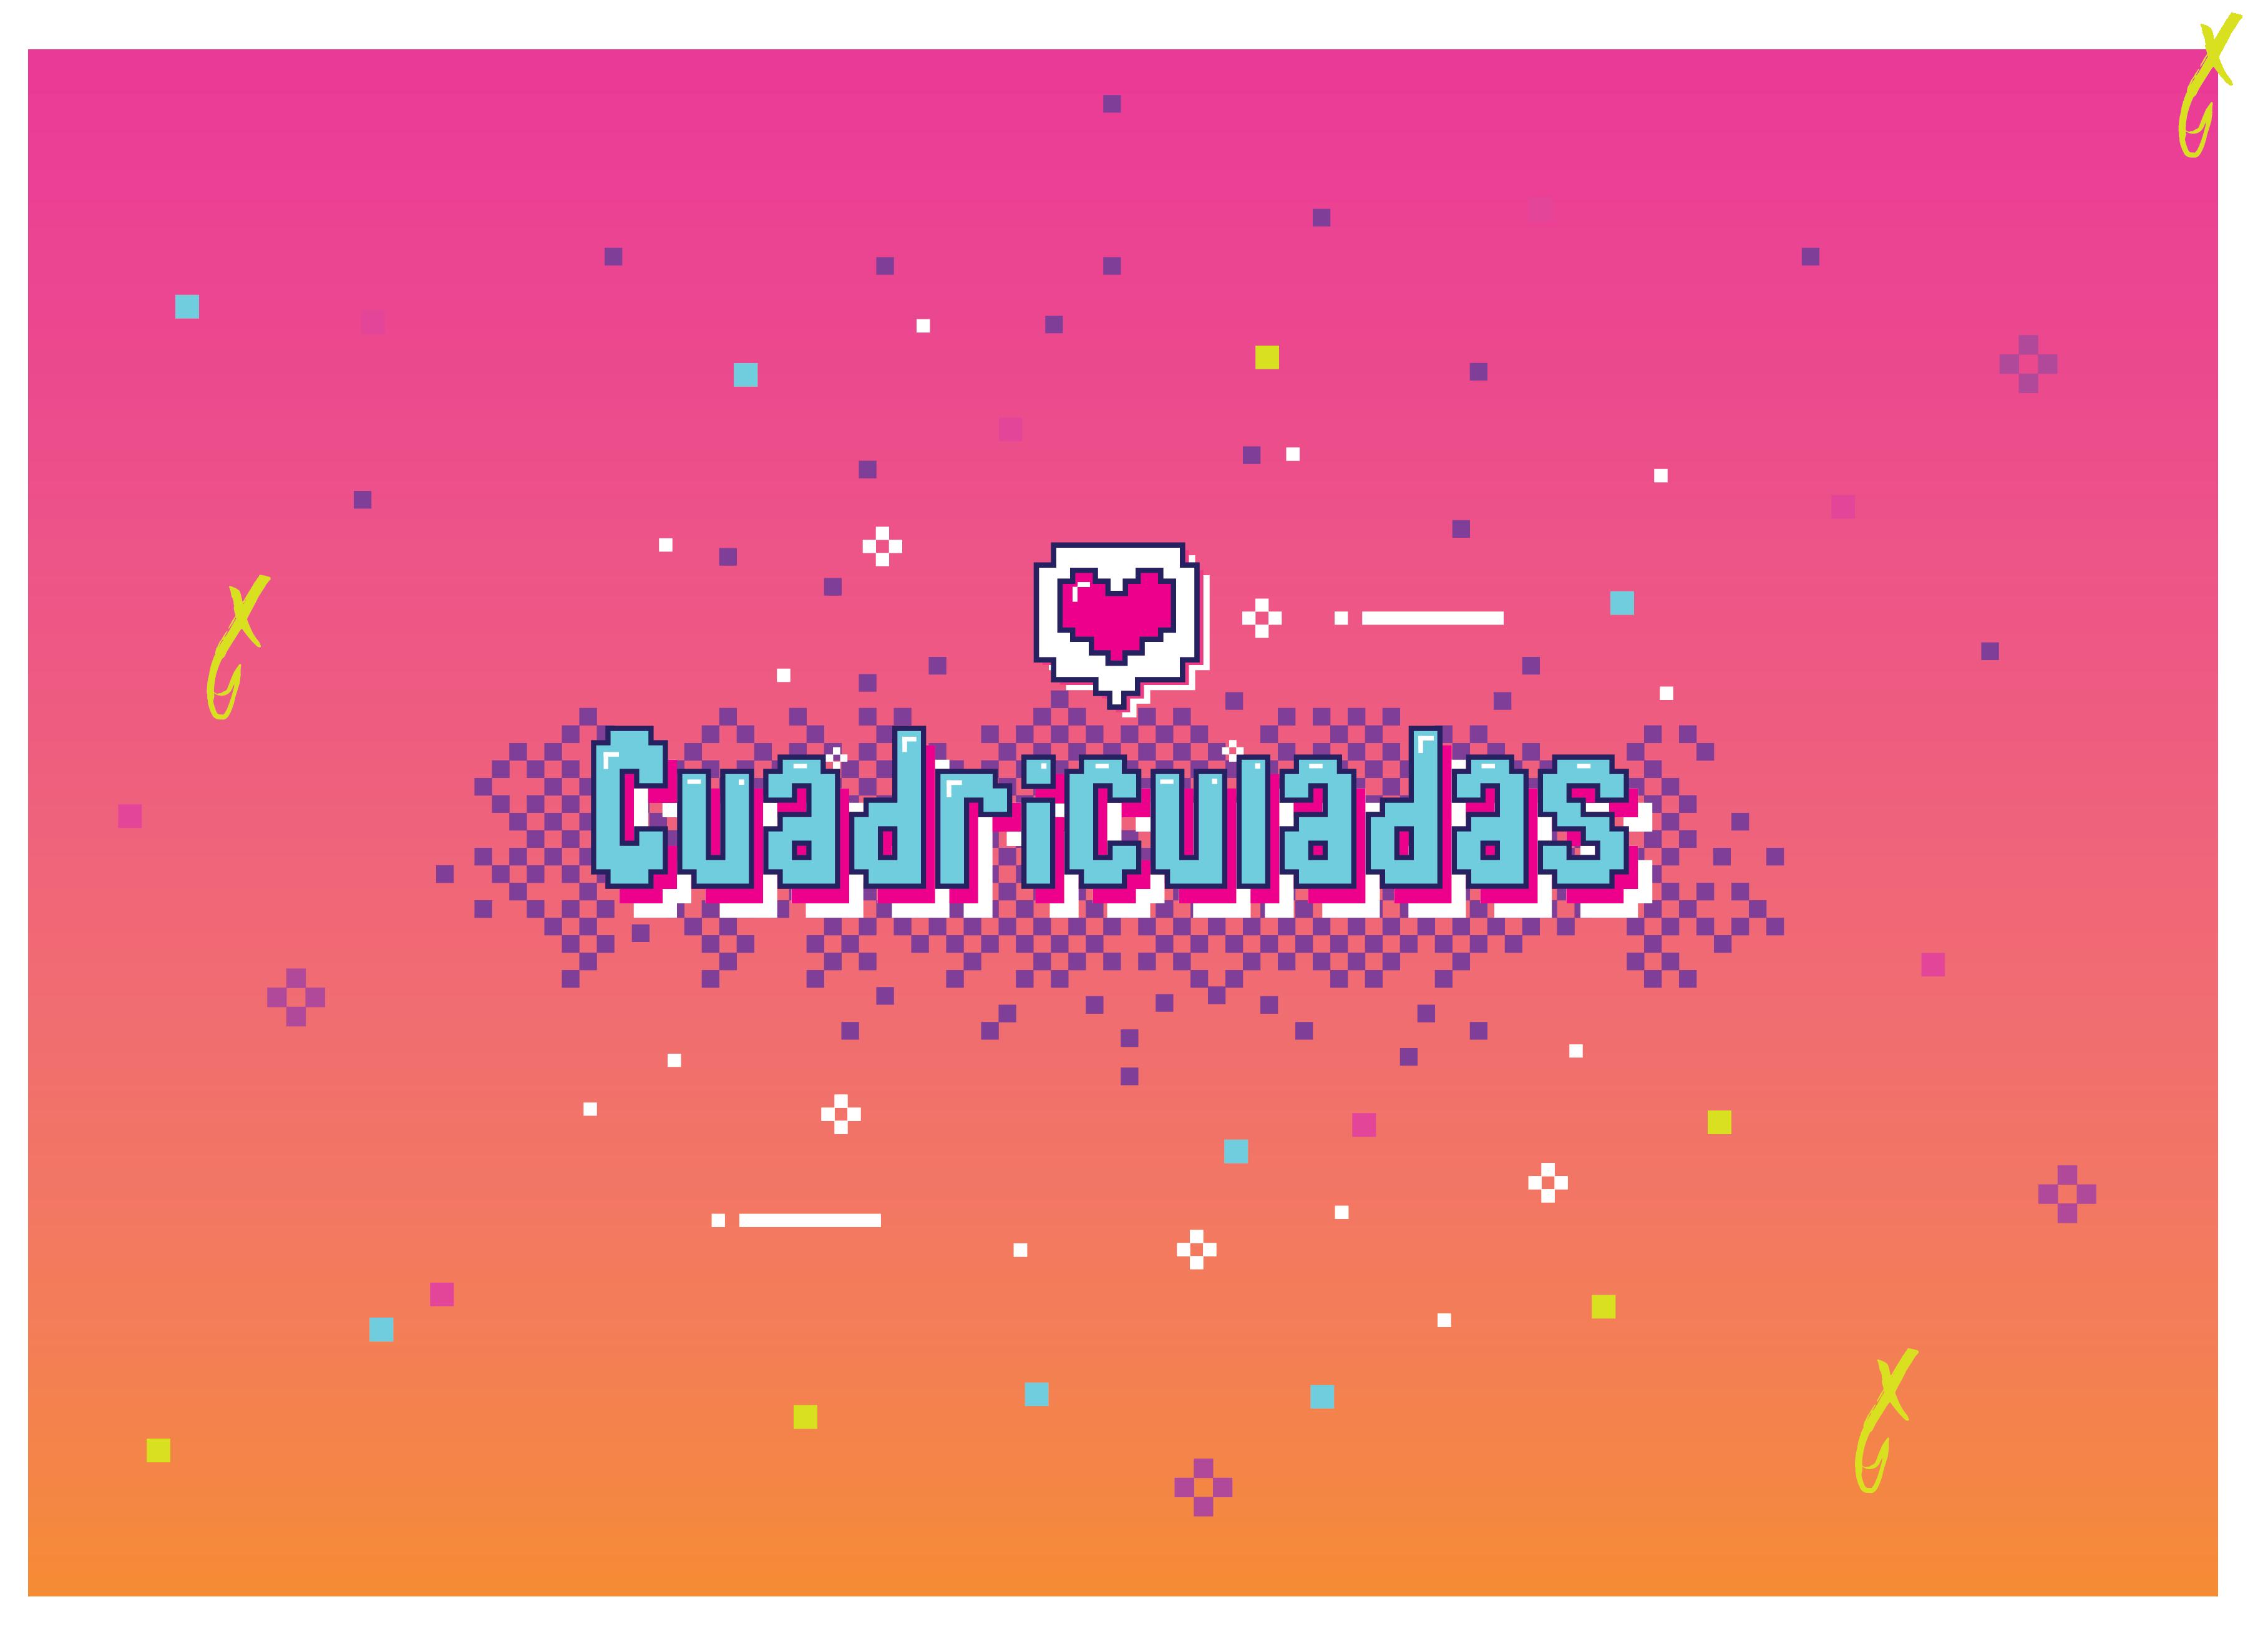 Elementos gráficos - Cuadriculadas-13